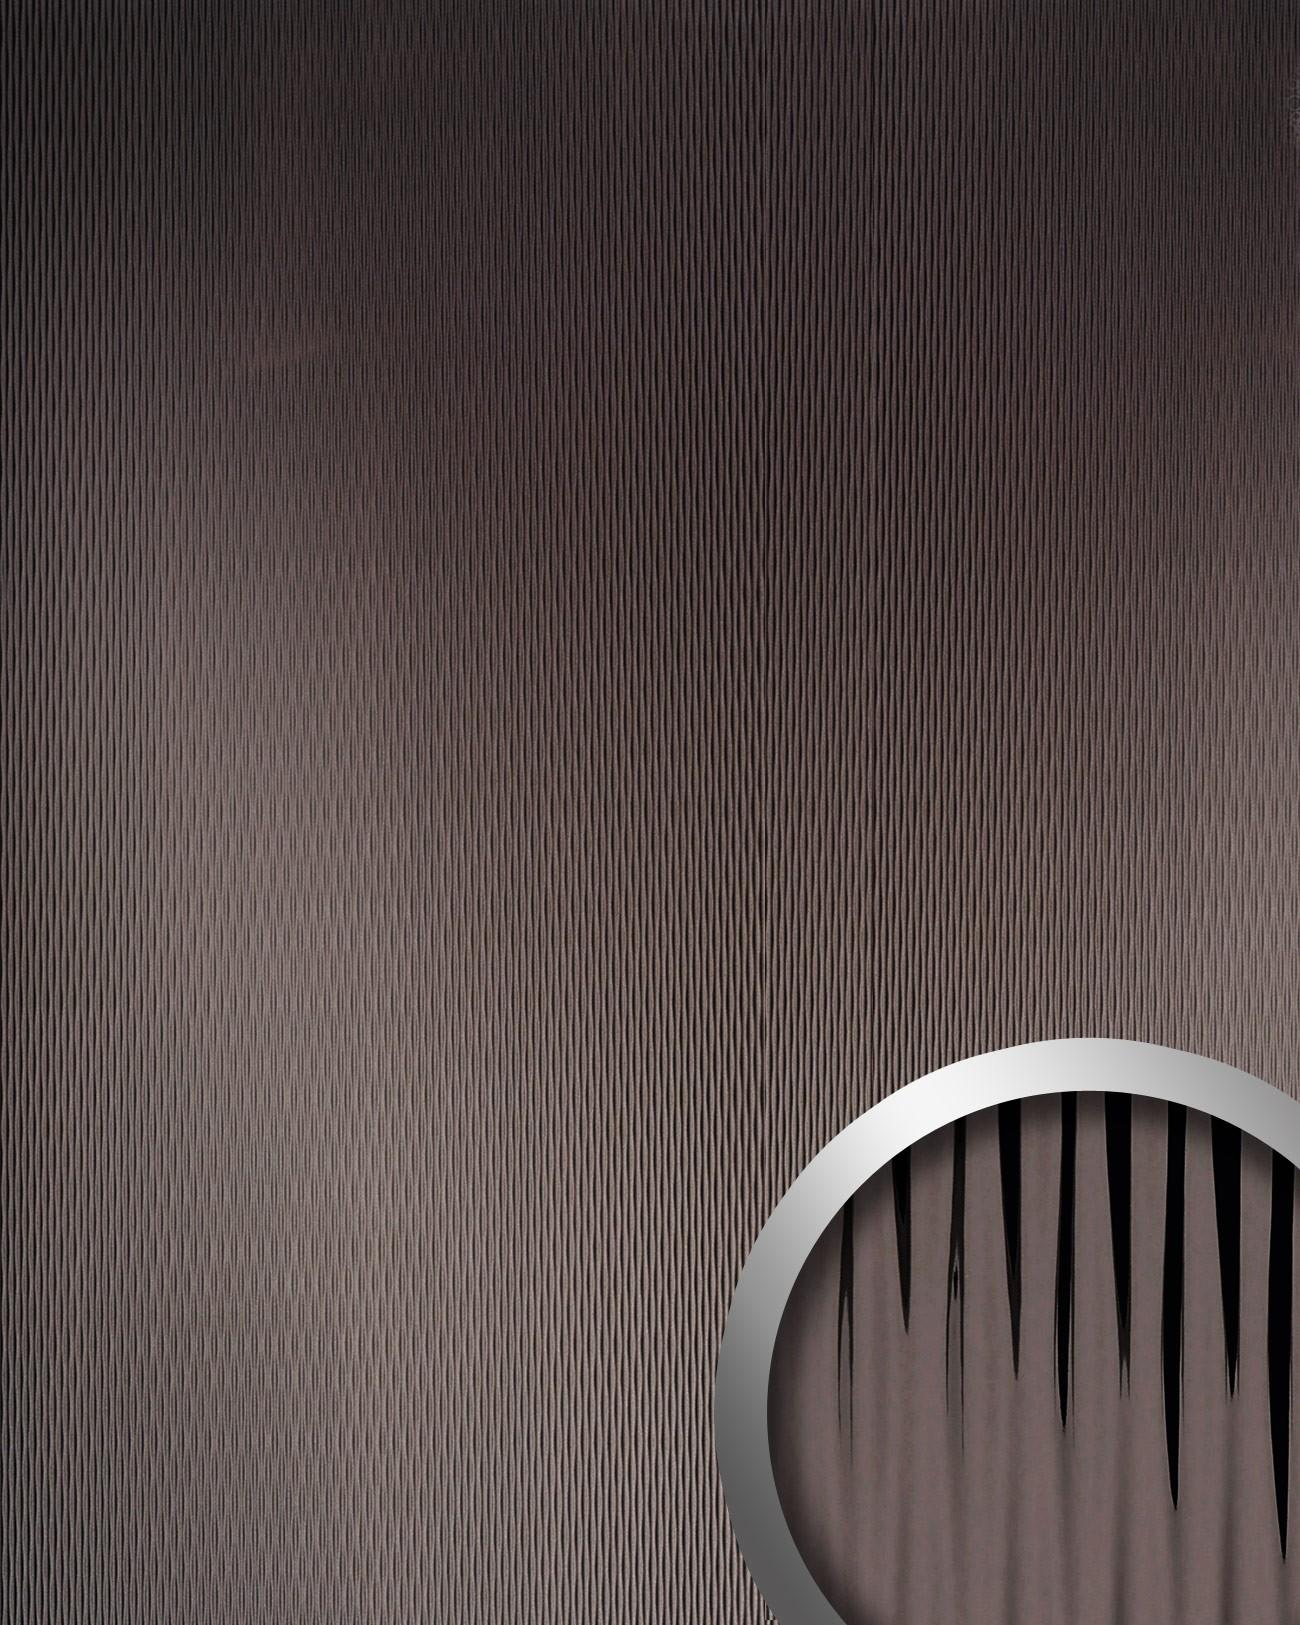 platten wandverkleidung garten ideen bilder. Black Bedroom Furniture Sets. Home Design Ideas